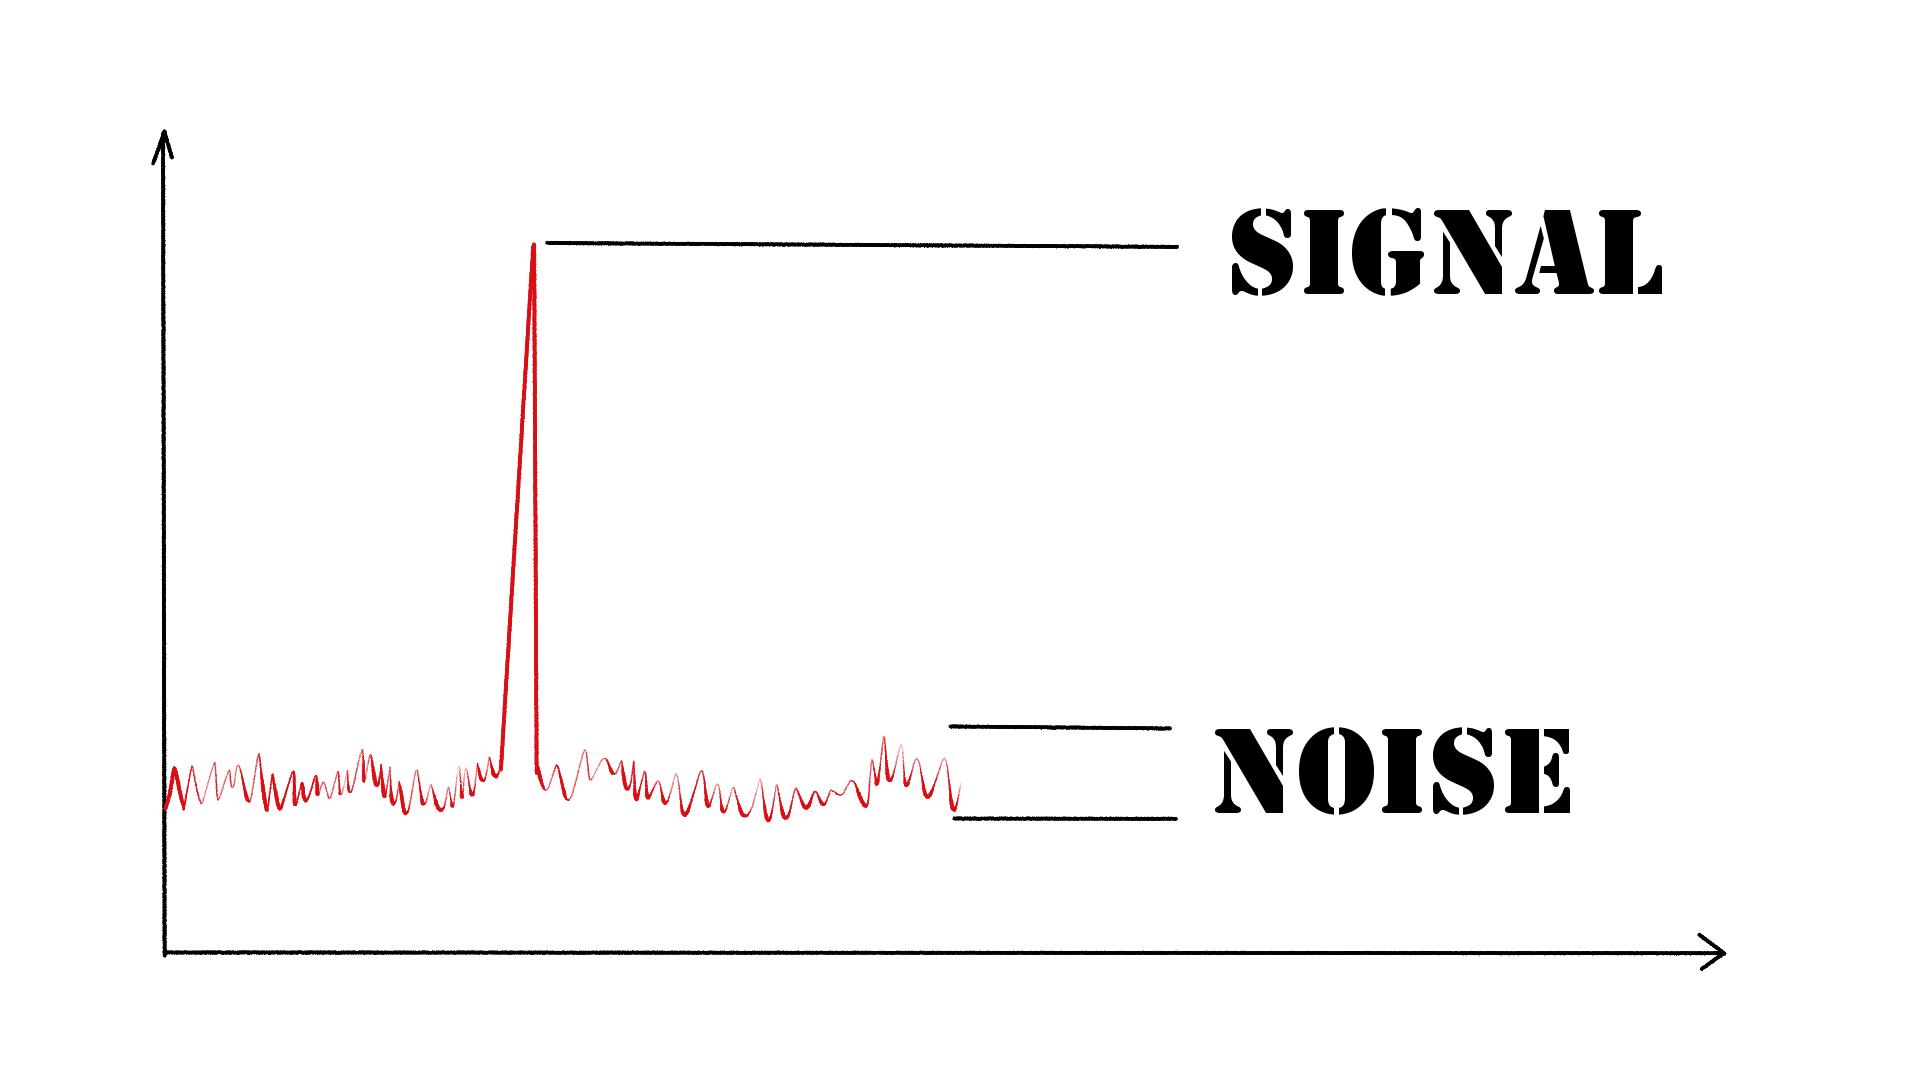 Noise on Olympus vs Sony cameras for birds in flight